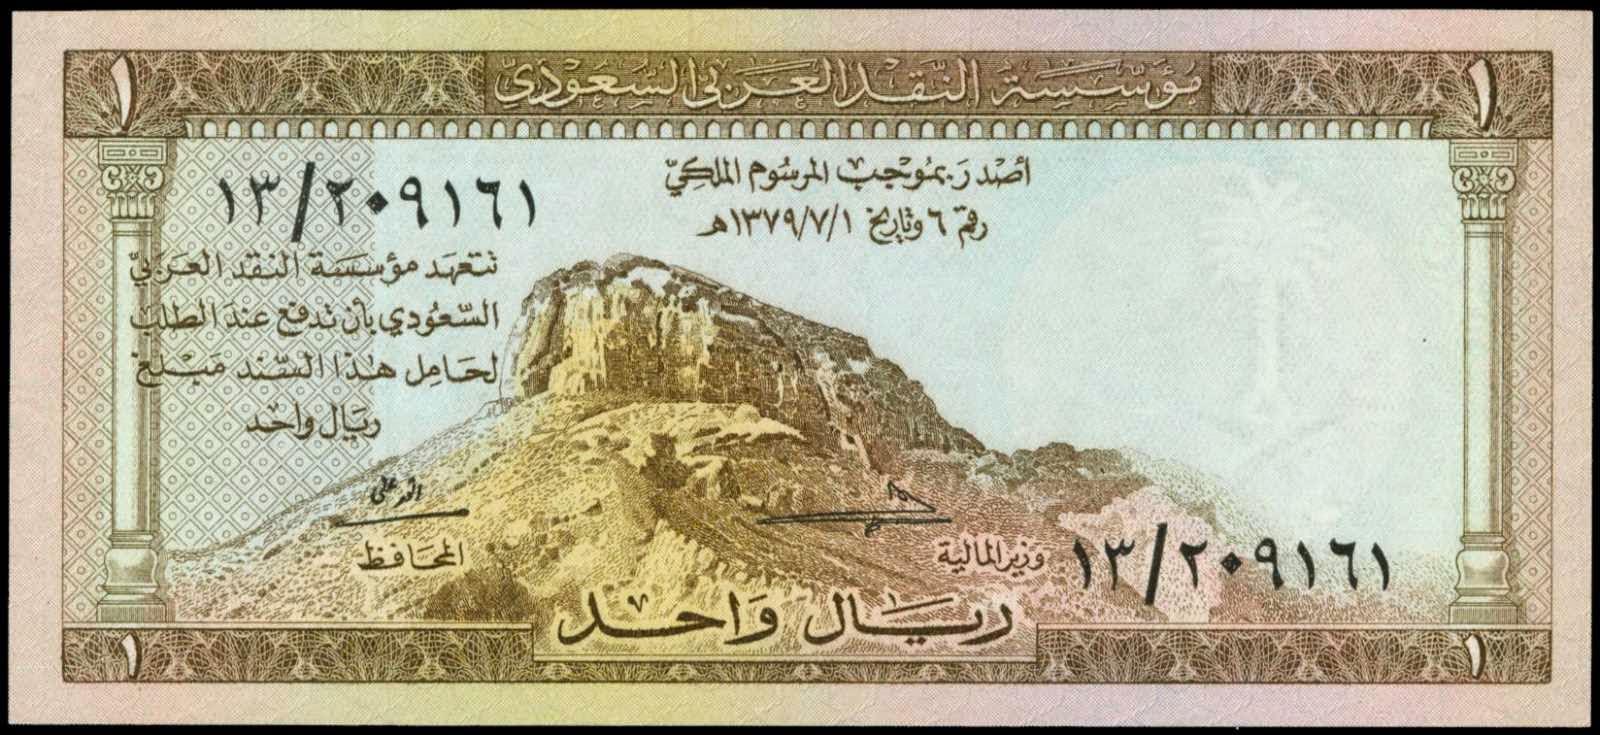 Saudi Arabia Banknotes 1 Riyal Note 1961 Jabal al-Nour in Mecca